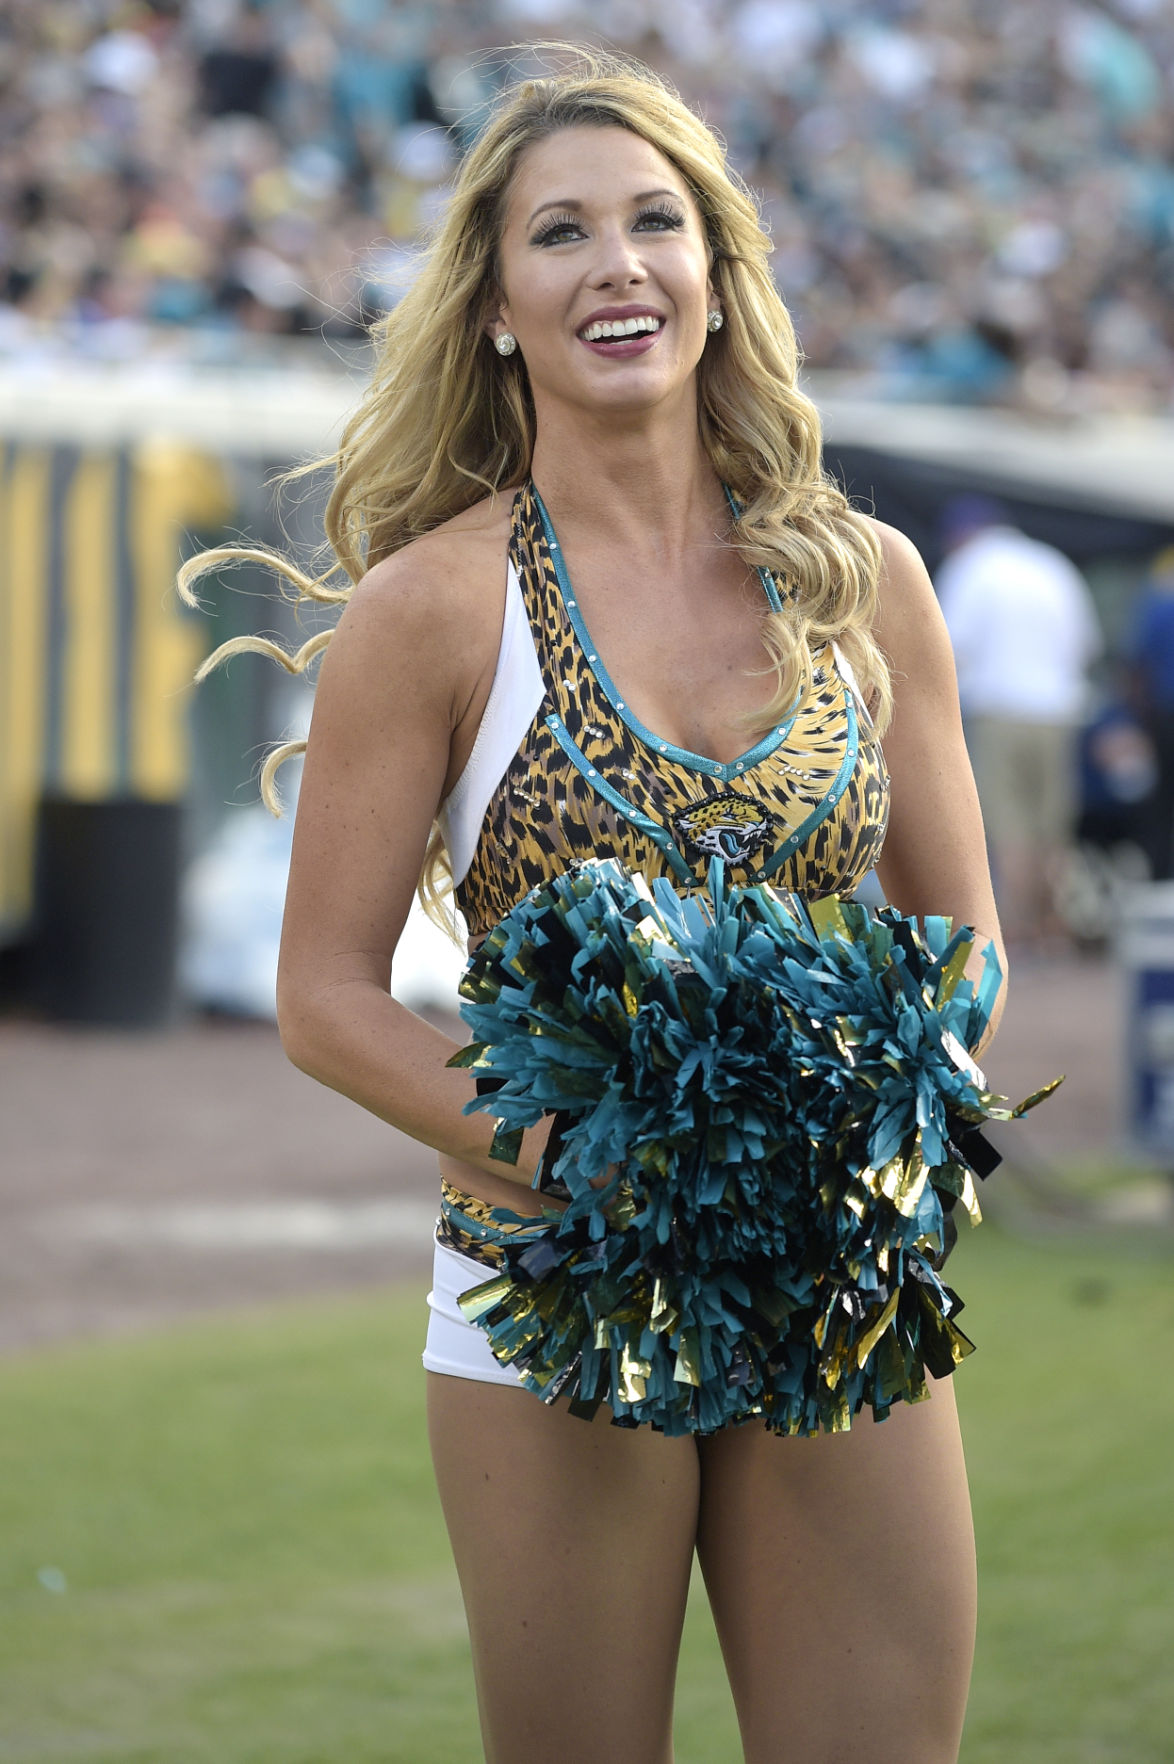 Photos: Cheerleaders | Galleries | tucson.com